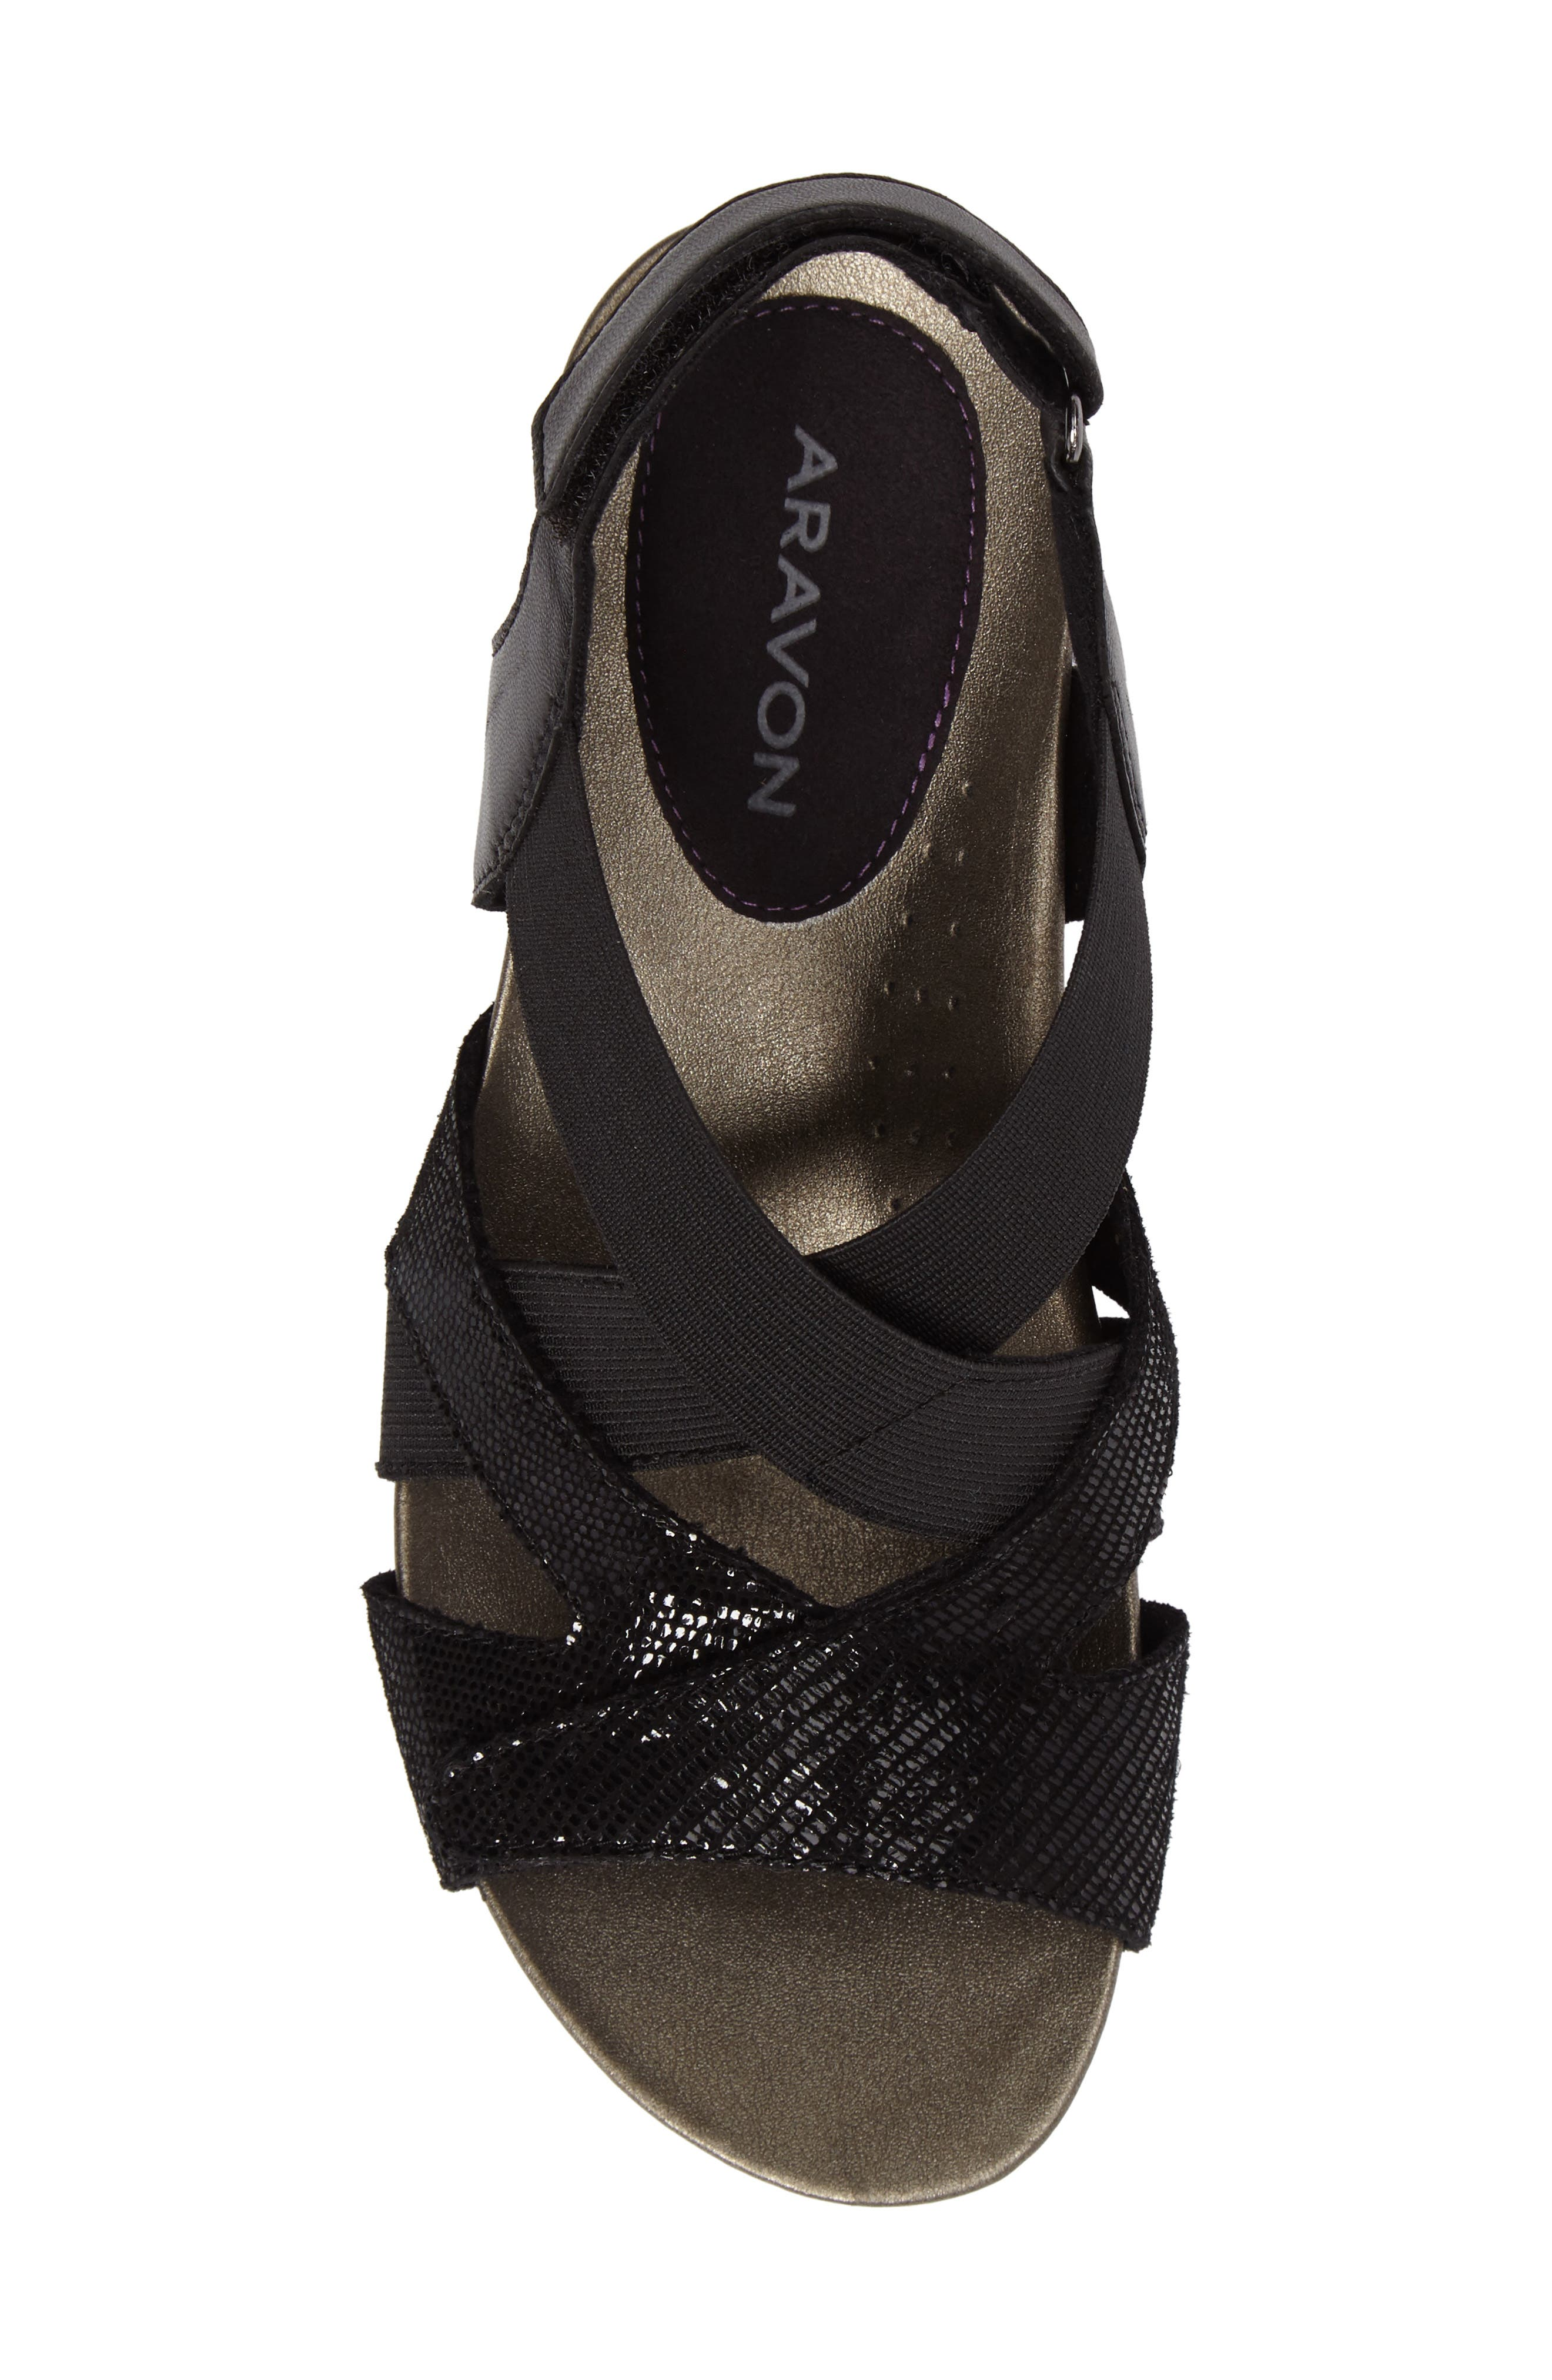 Standon Cross Strap Sandal,                             Alternate thumbnail 5, color,                             001